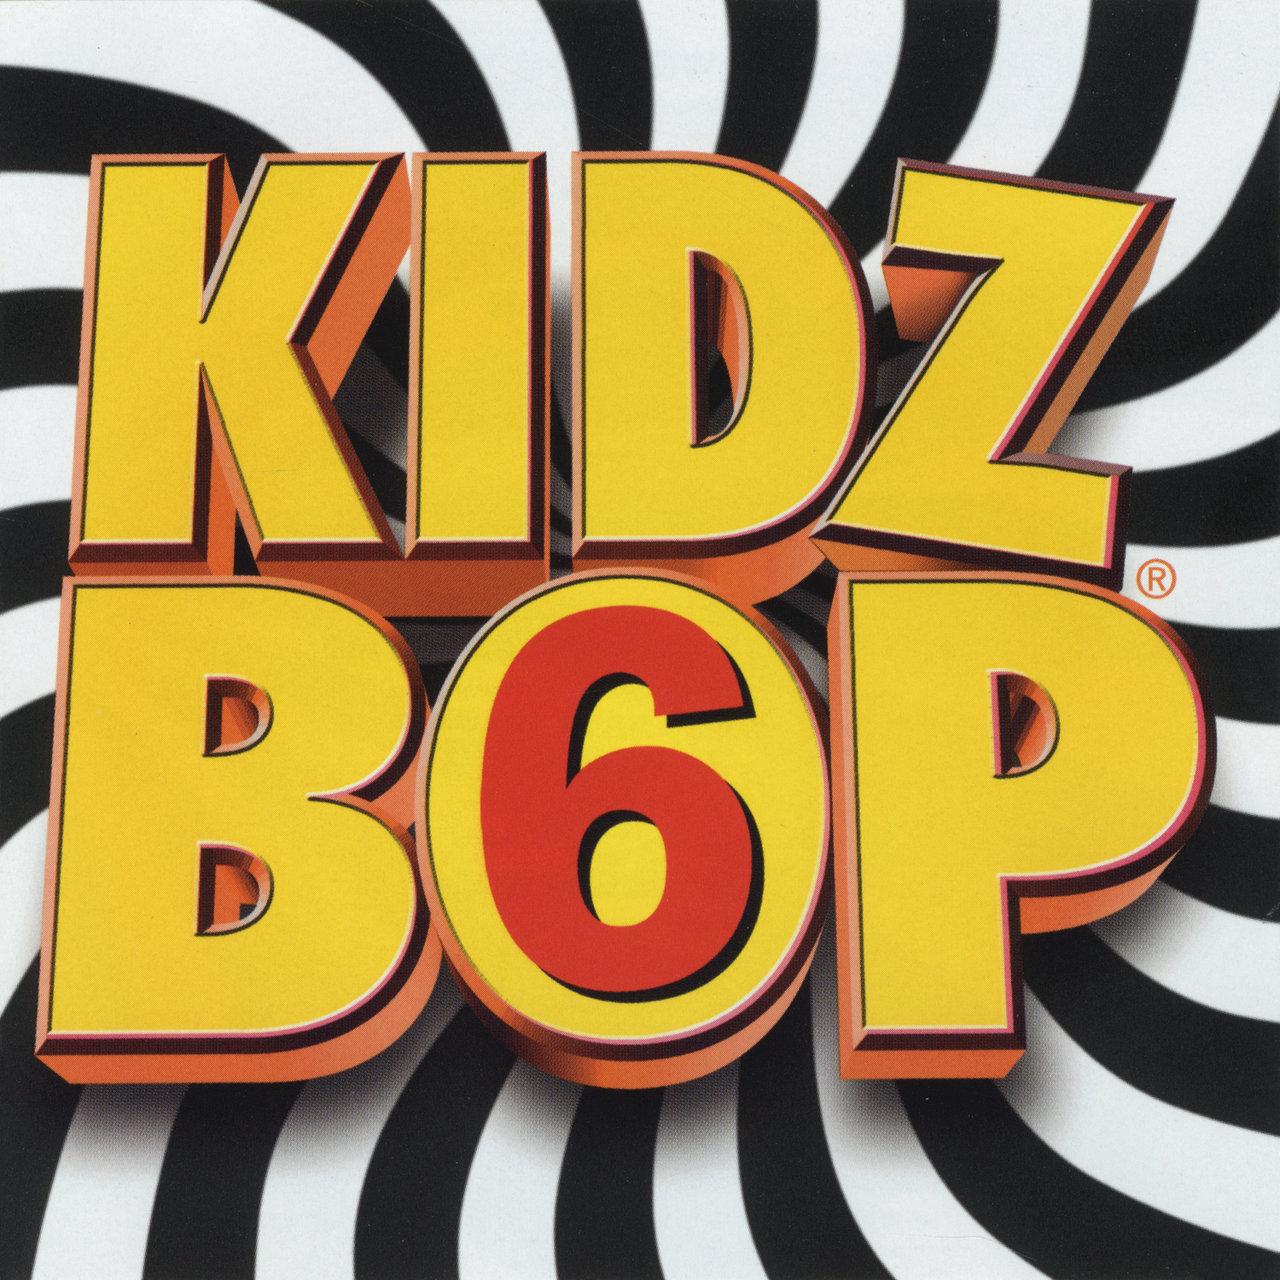 Kidz Bop 6 / Kidz Bop Kids TIDAL